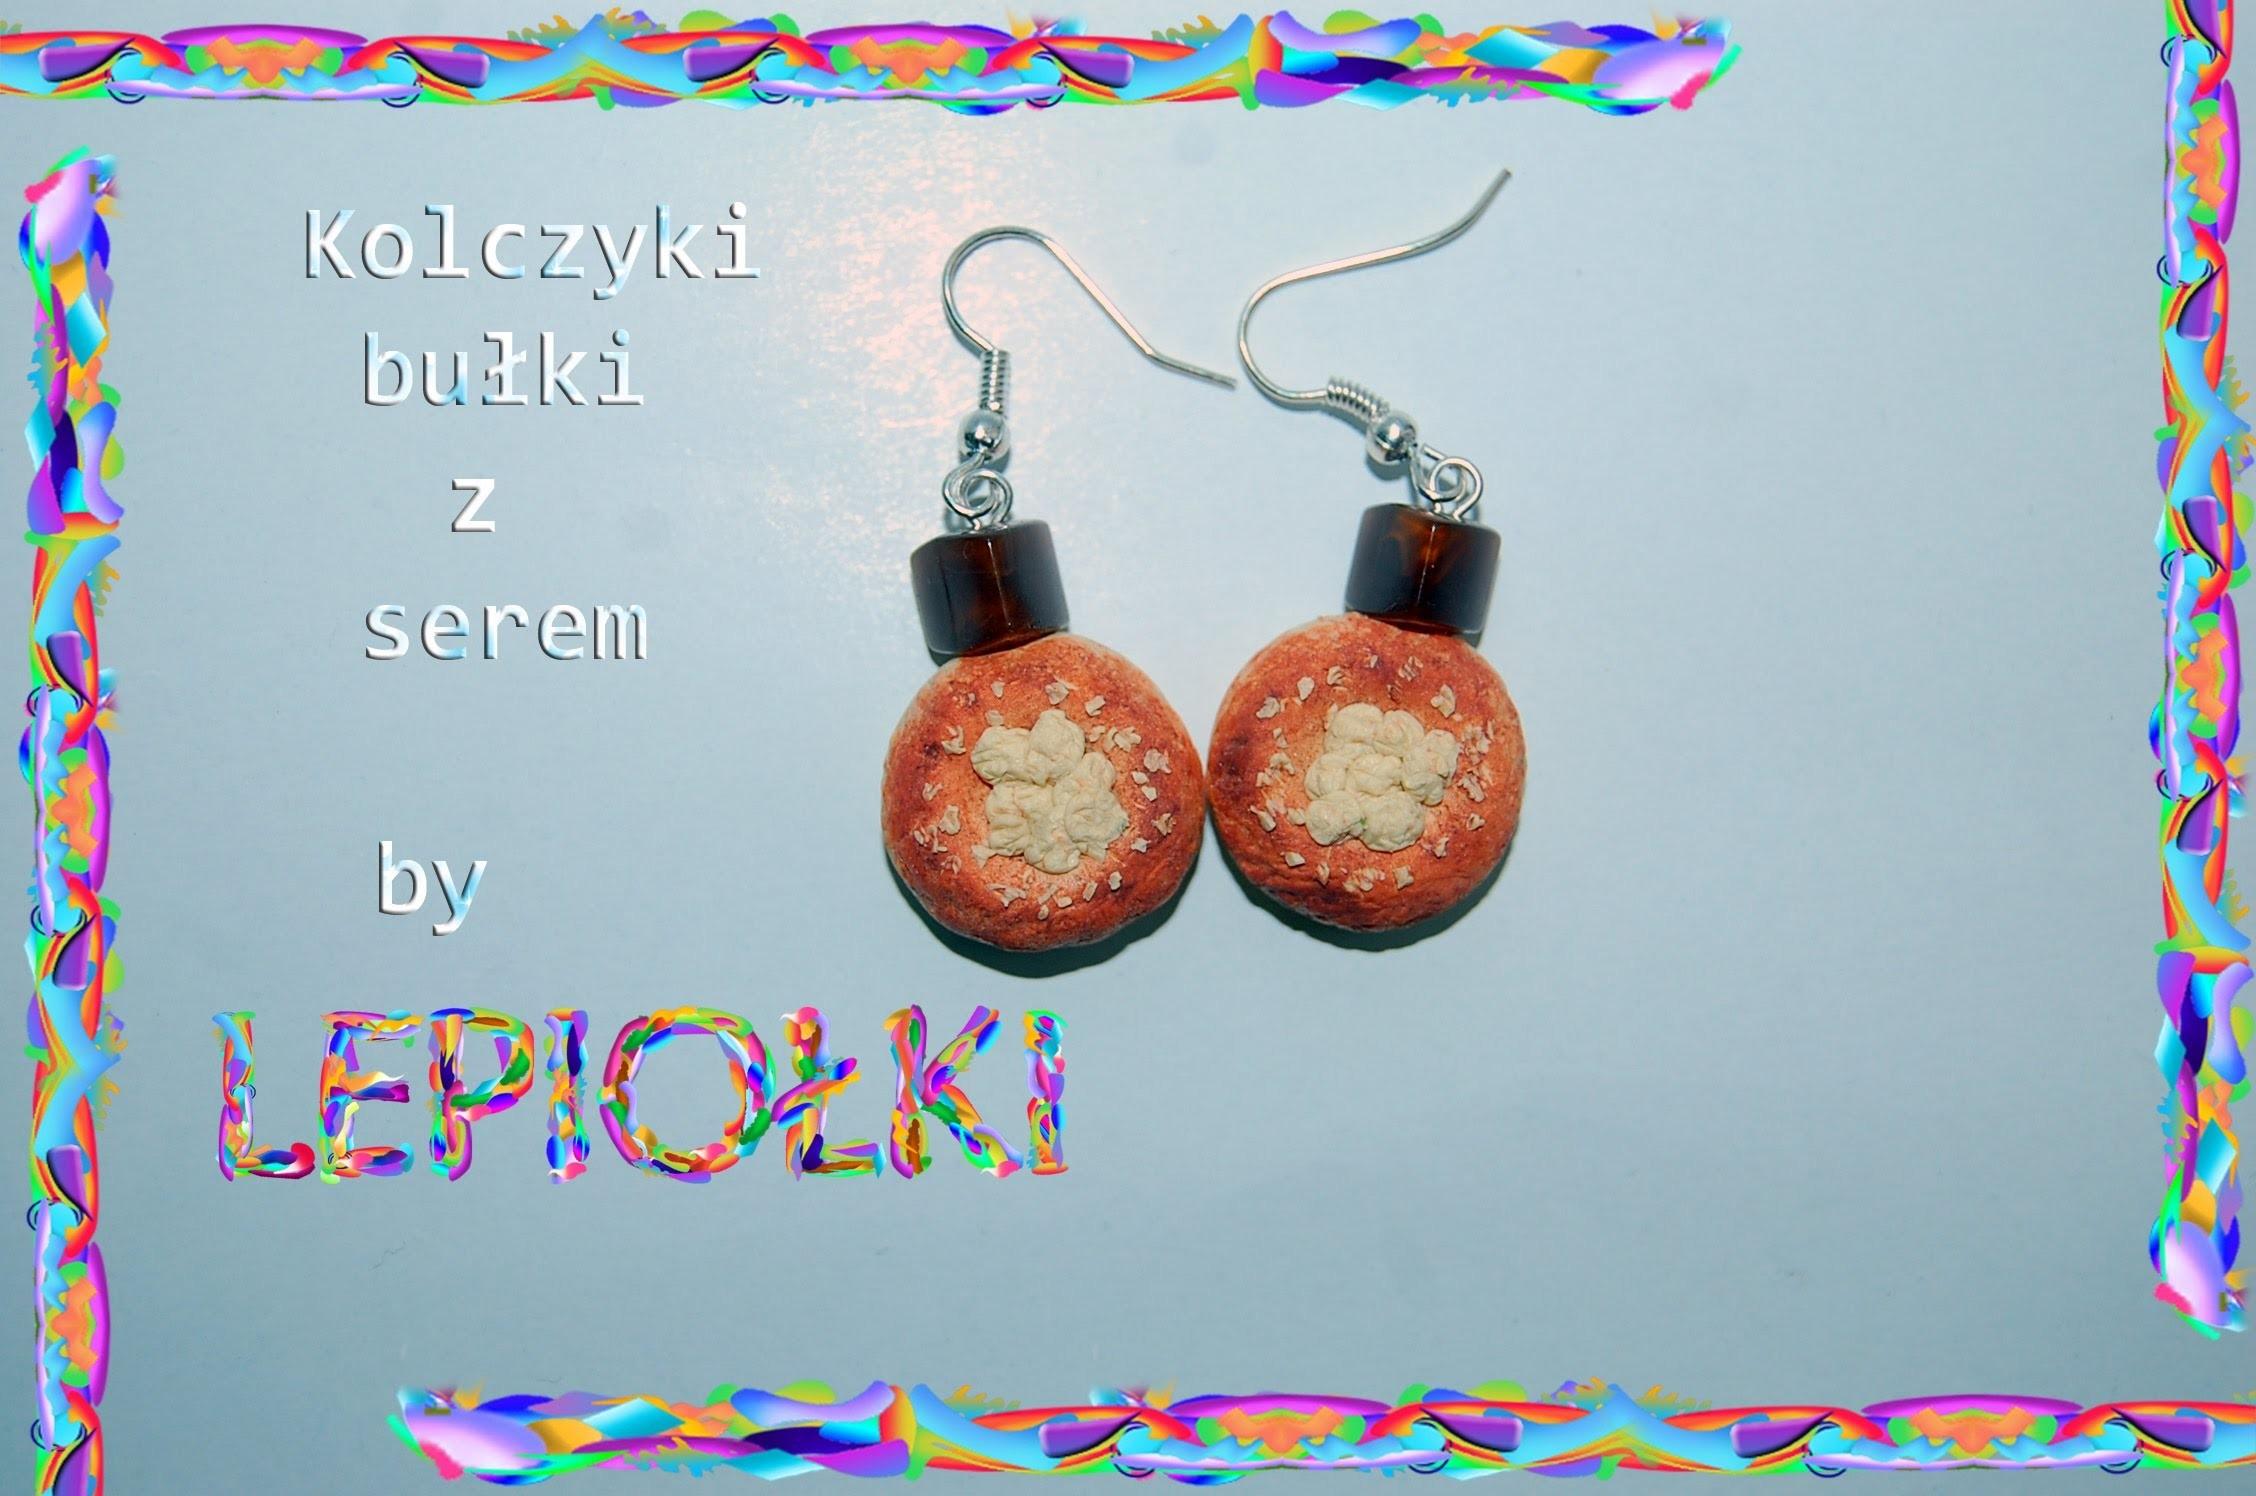 Lepiołki: Bułka z serem TUTORIAL roll of cheese,polymer clay, made hand,  Miniature Food